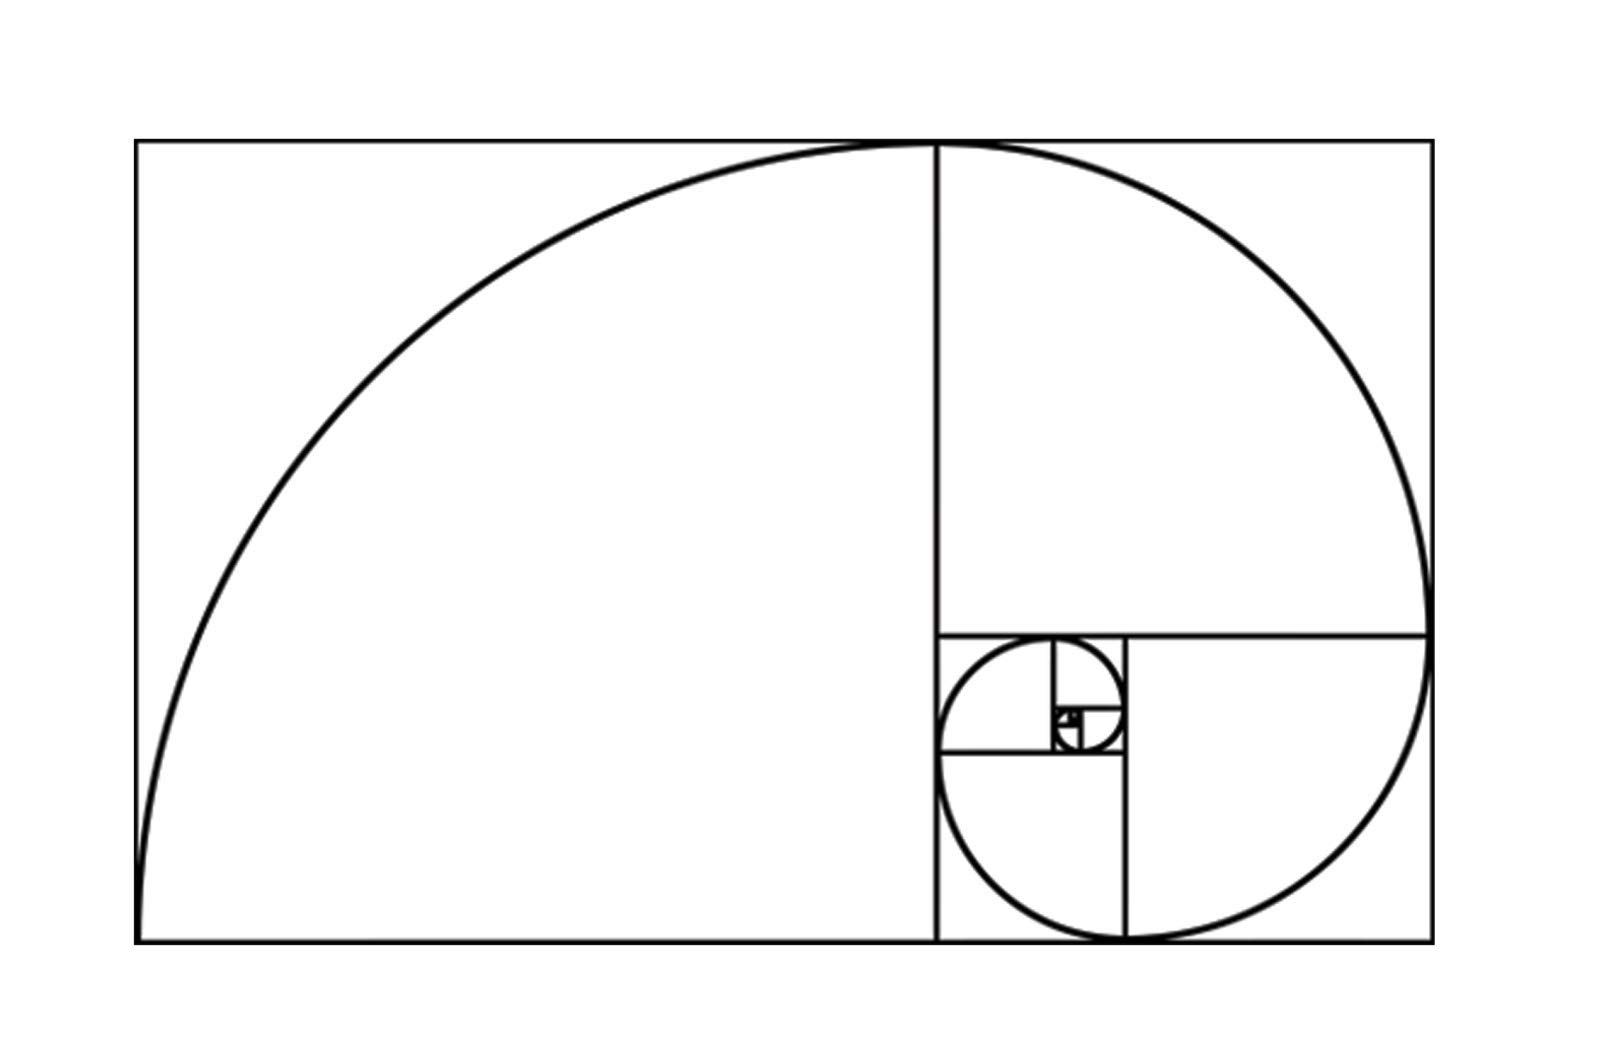 Frankies Cajun Customs Fibonacci Spiral Golden Ratio Vinyl Decal, Wall, Car, Laptop - Brown - 50 inch